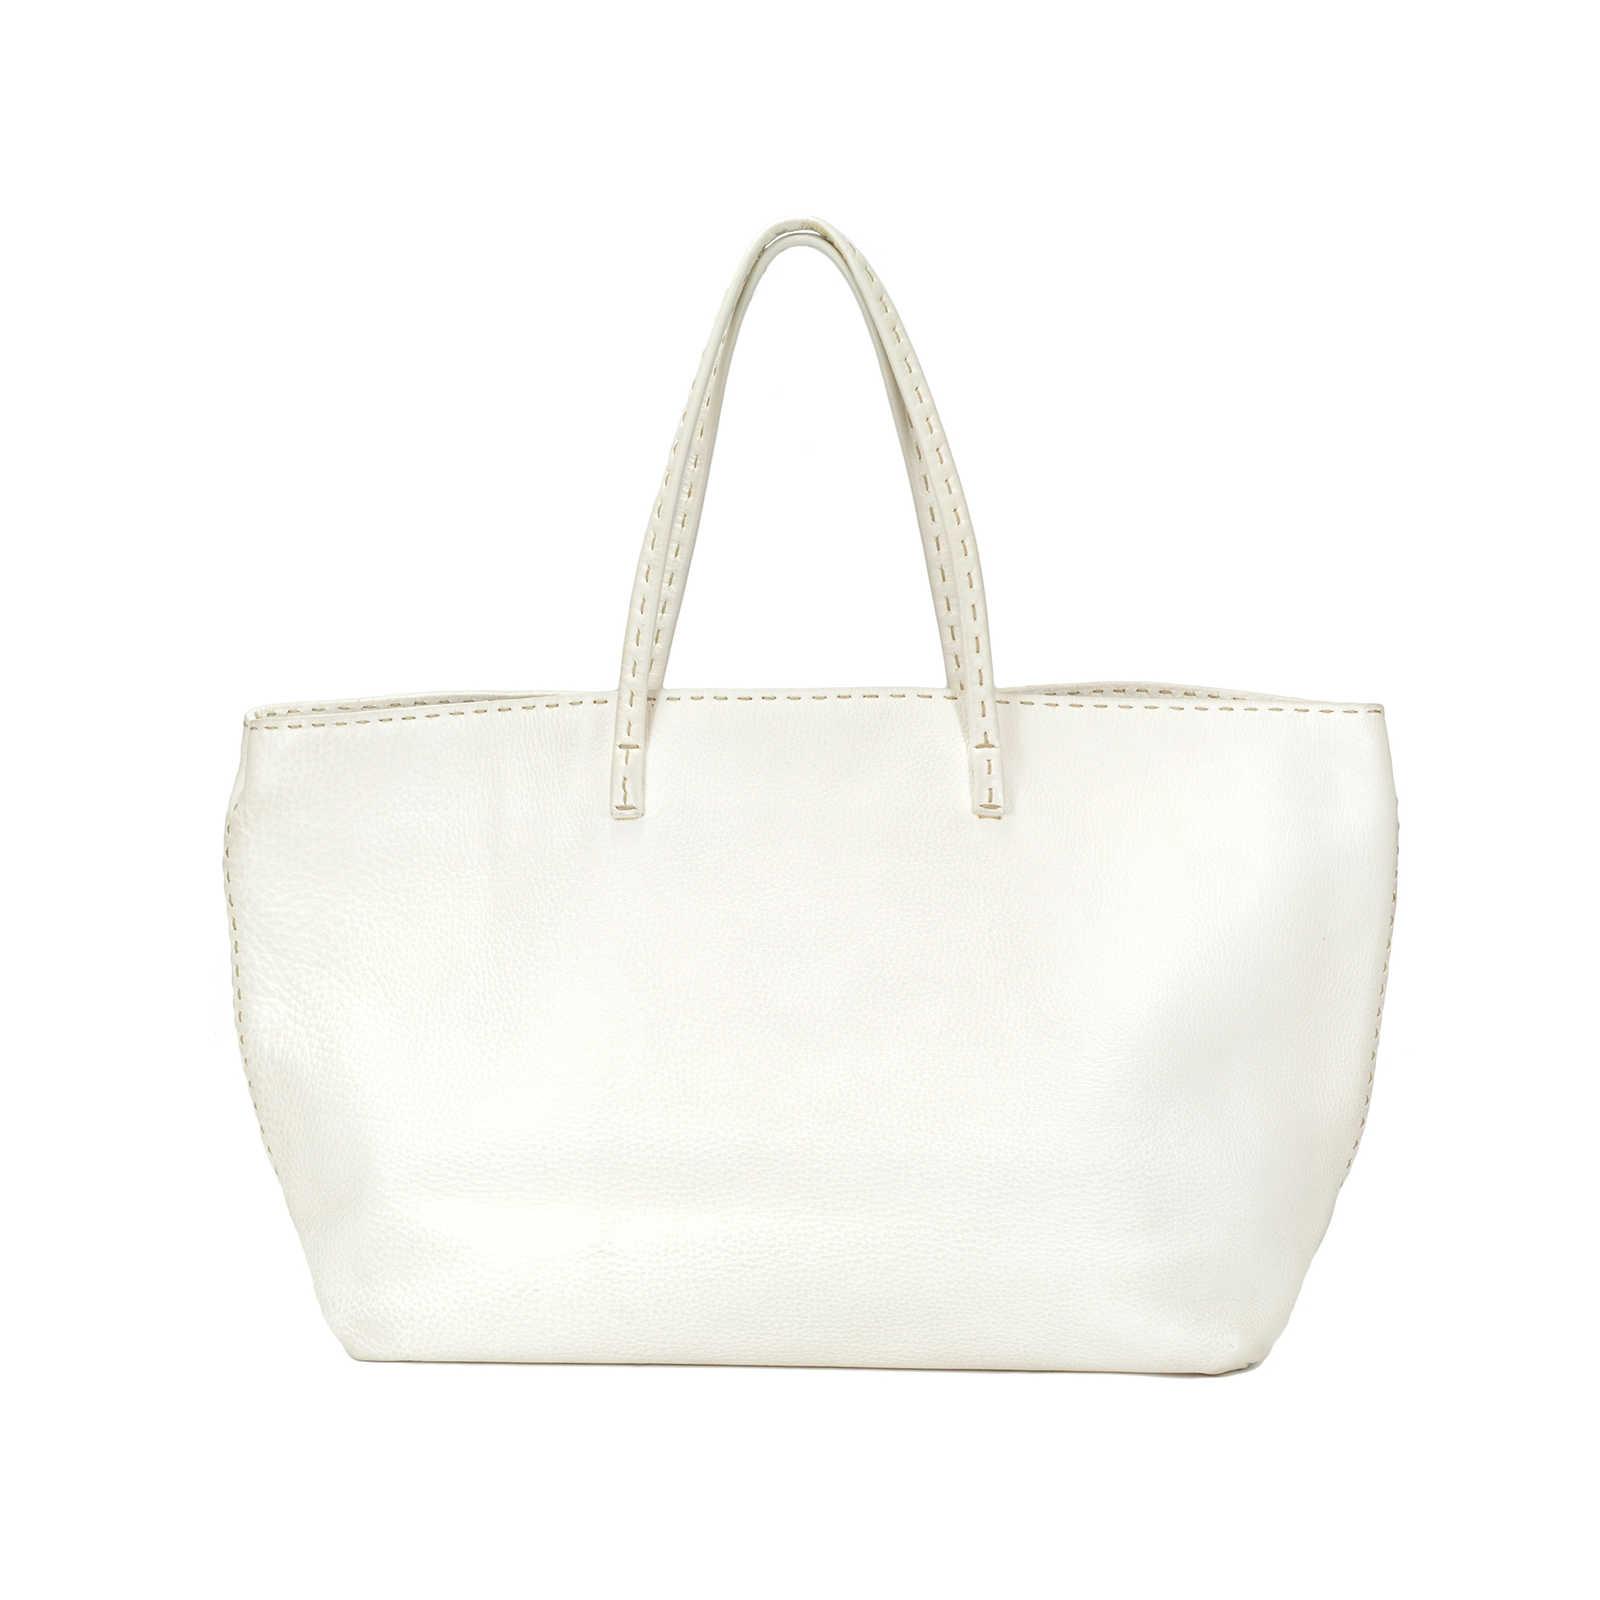 ... peekaboo bag 0c917 5d54e italy fendi selleria shopper tote thumbnail 0  3447c 8b603 ... f00accec9def0